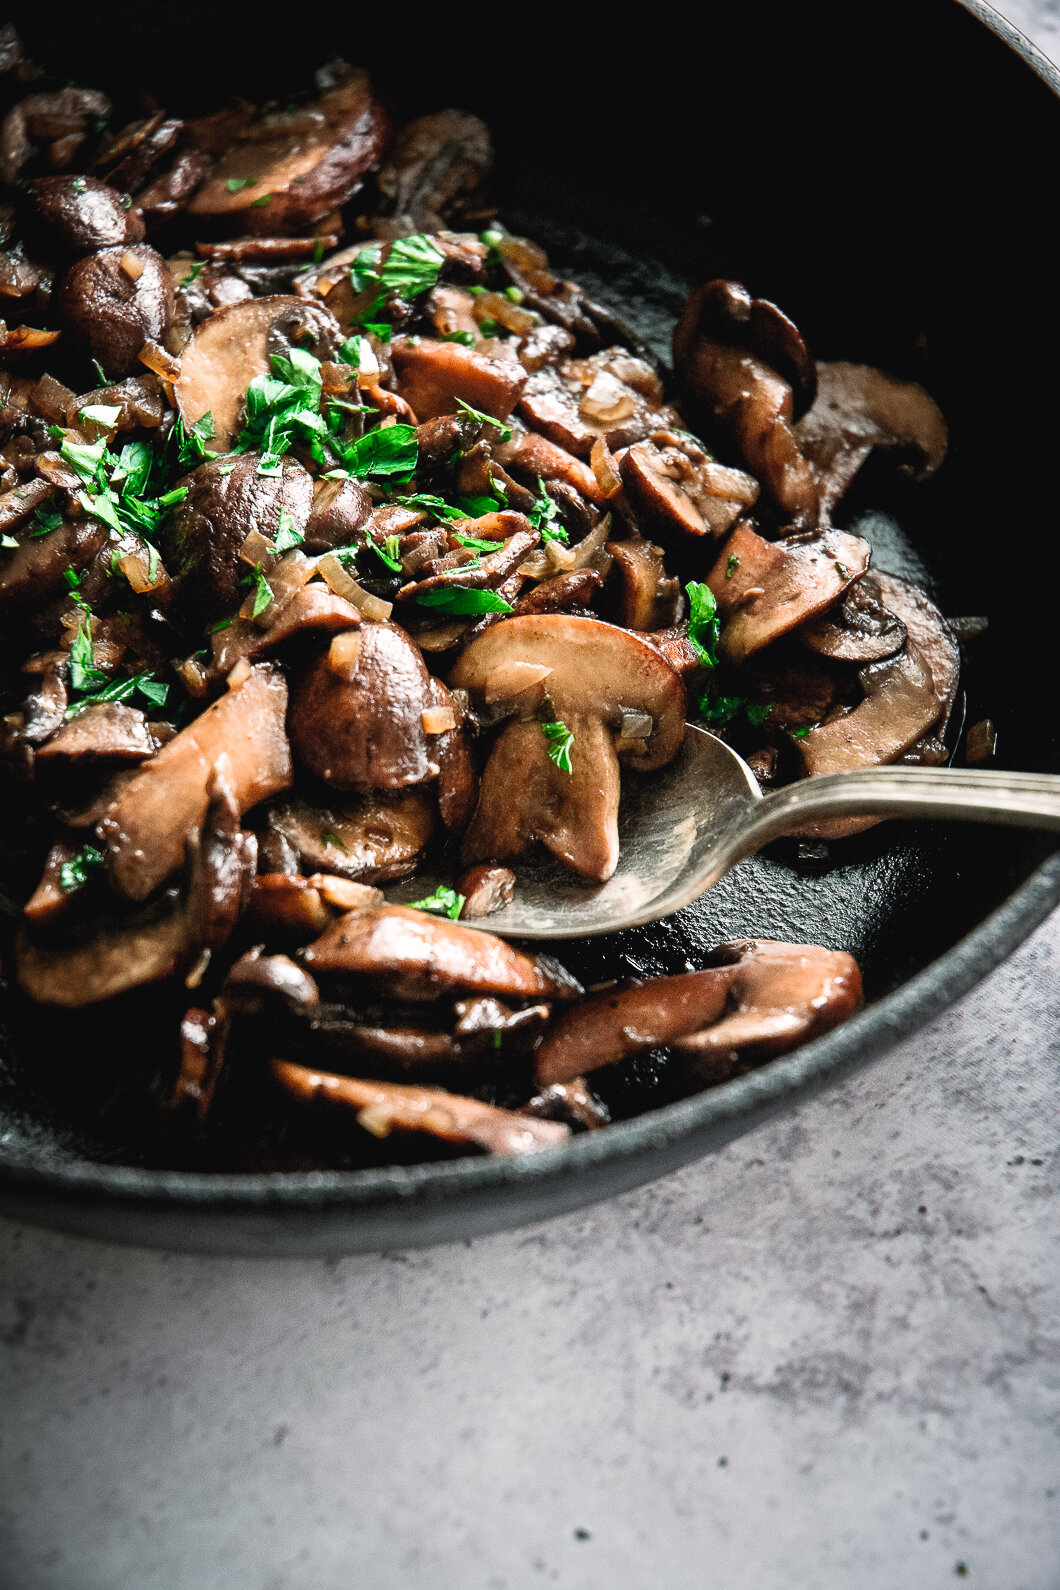 Sautéed mushrooms in pan with spoon